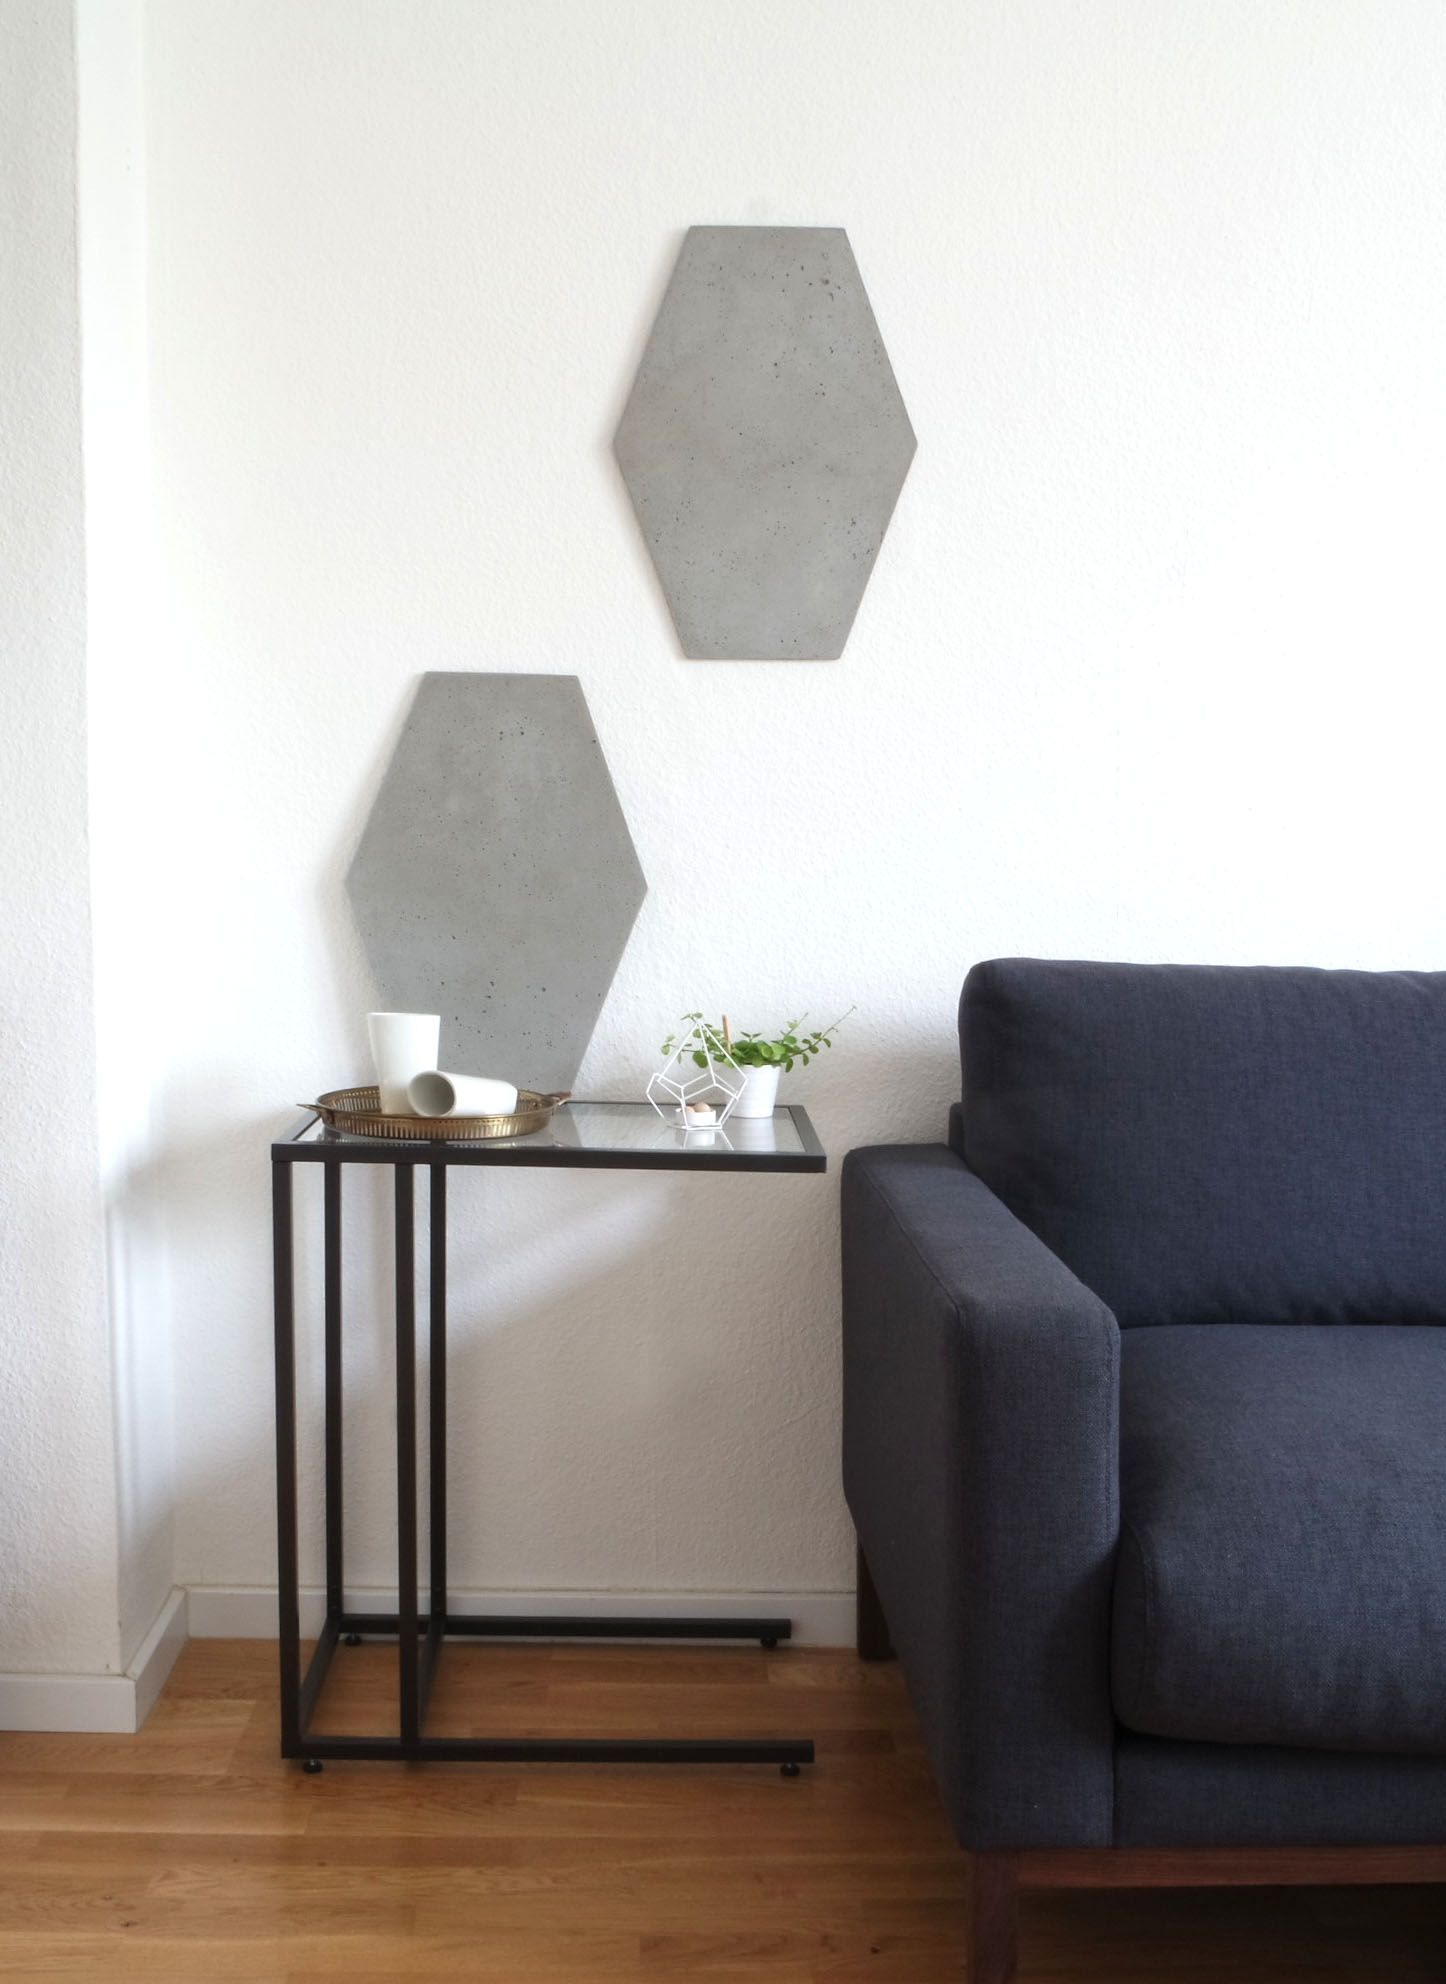 Wandgestaltung Beton grafische wandgestaltung aus beton filigran dünnwandig leicht